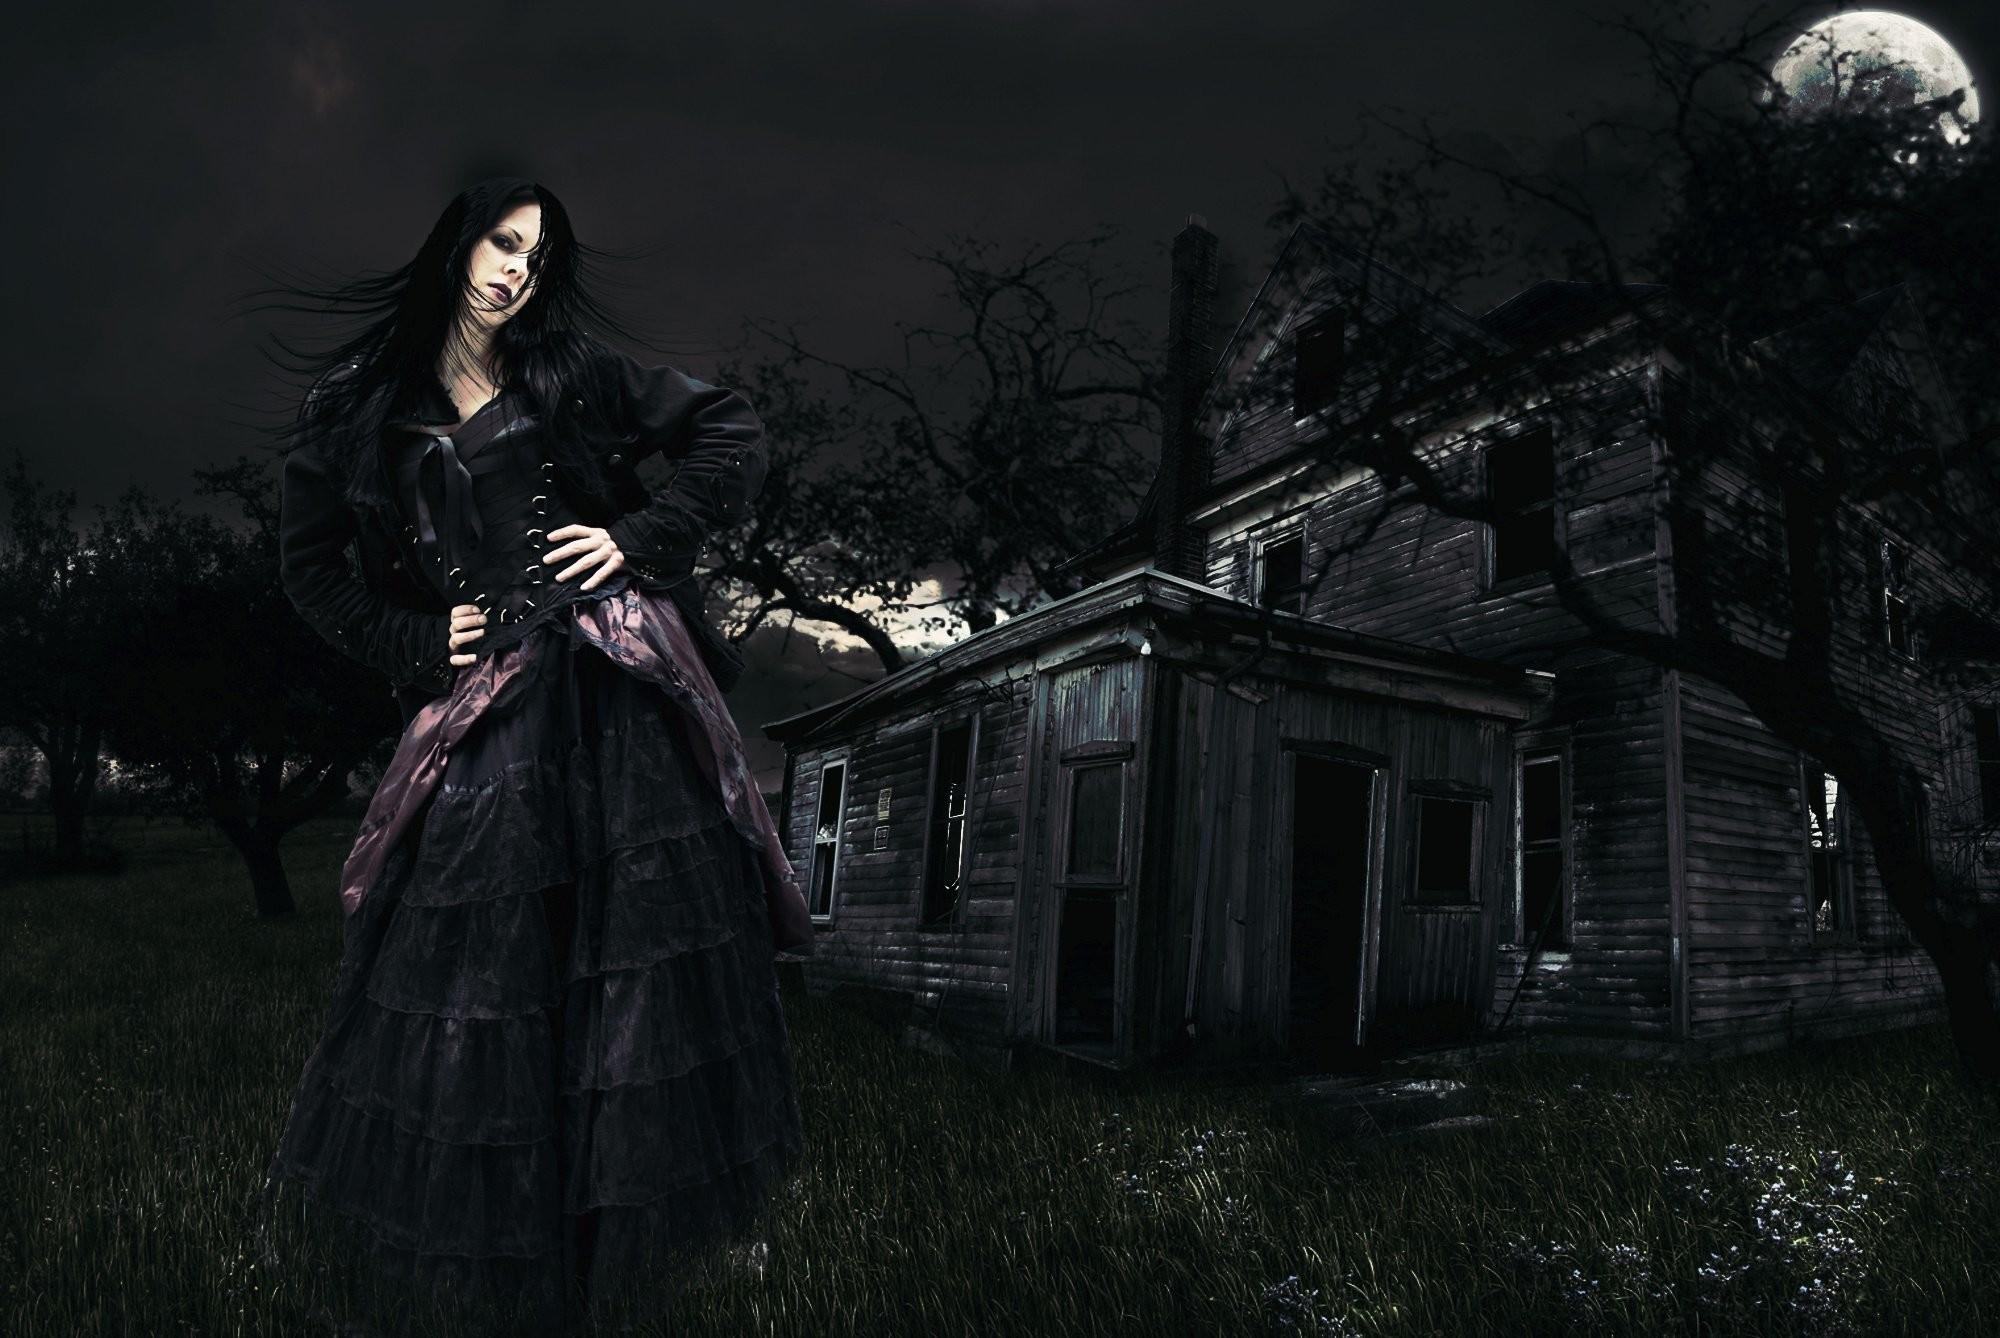 Night Moon Beautiful Witch Dark Fantasy Gothic Wallpaper At Dark Wallpapers